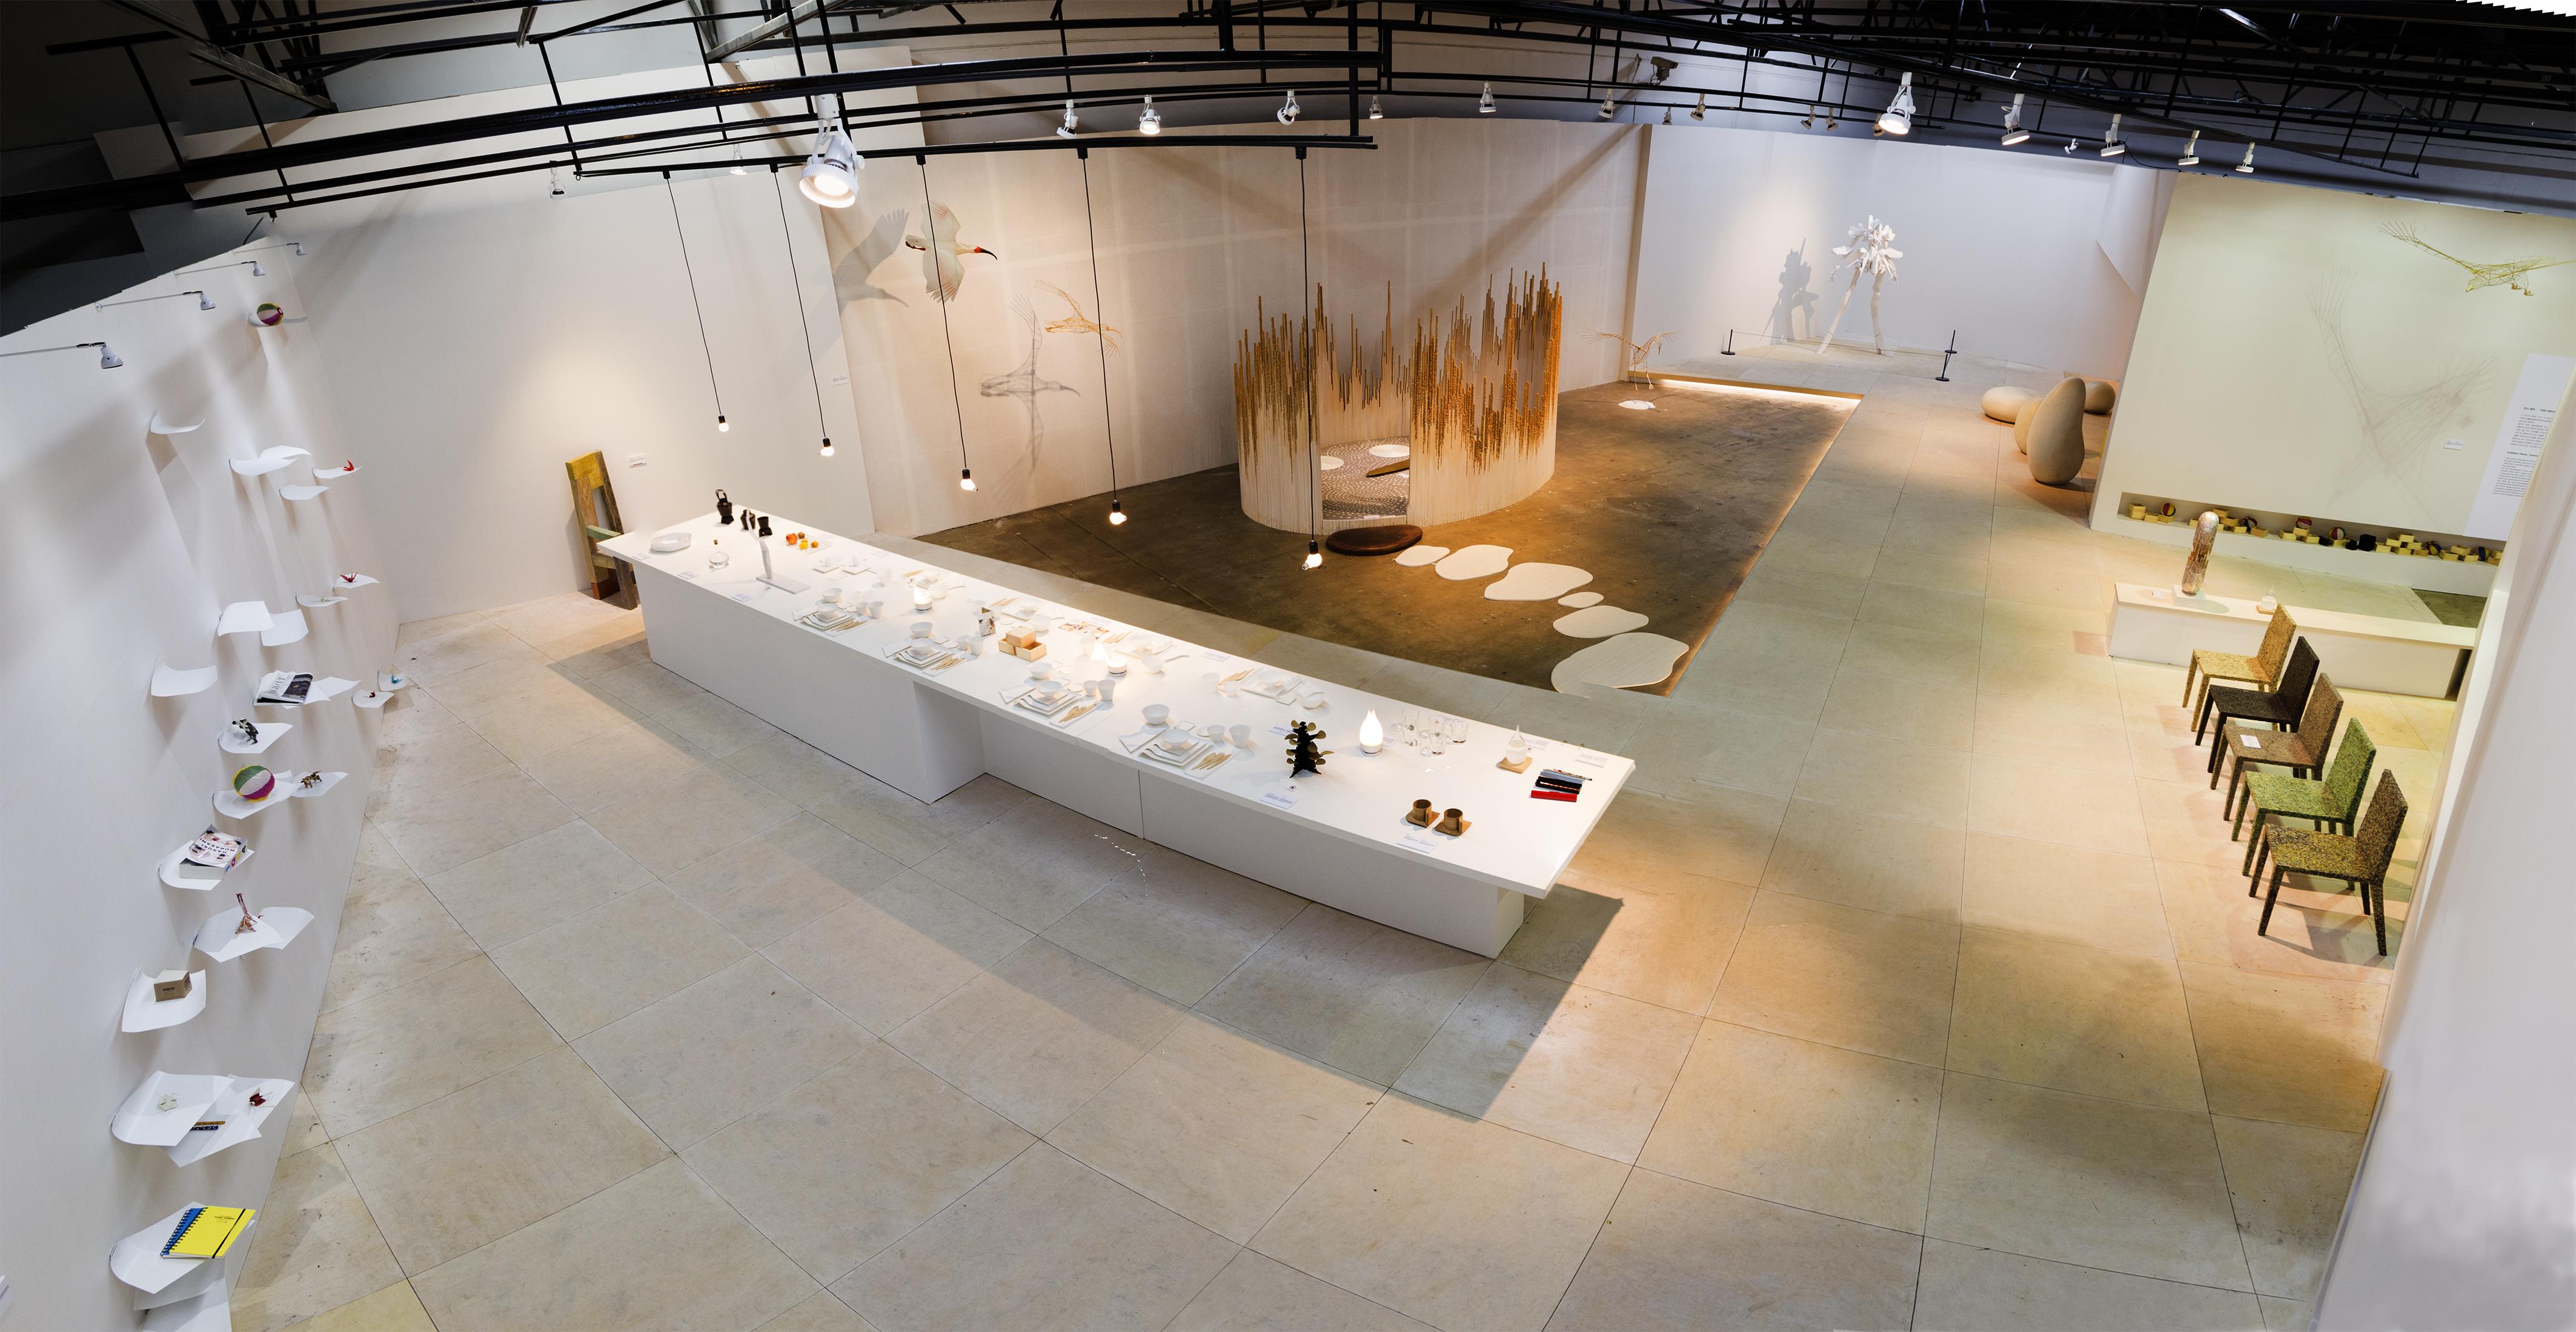 Gwangju design biennale 2015